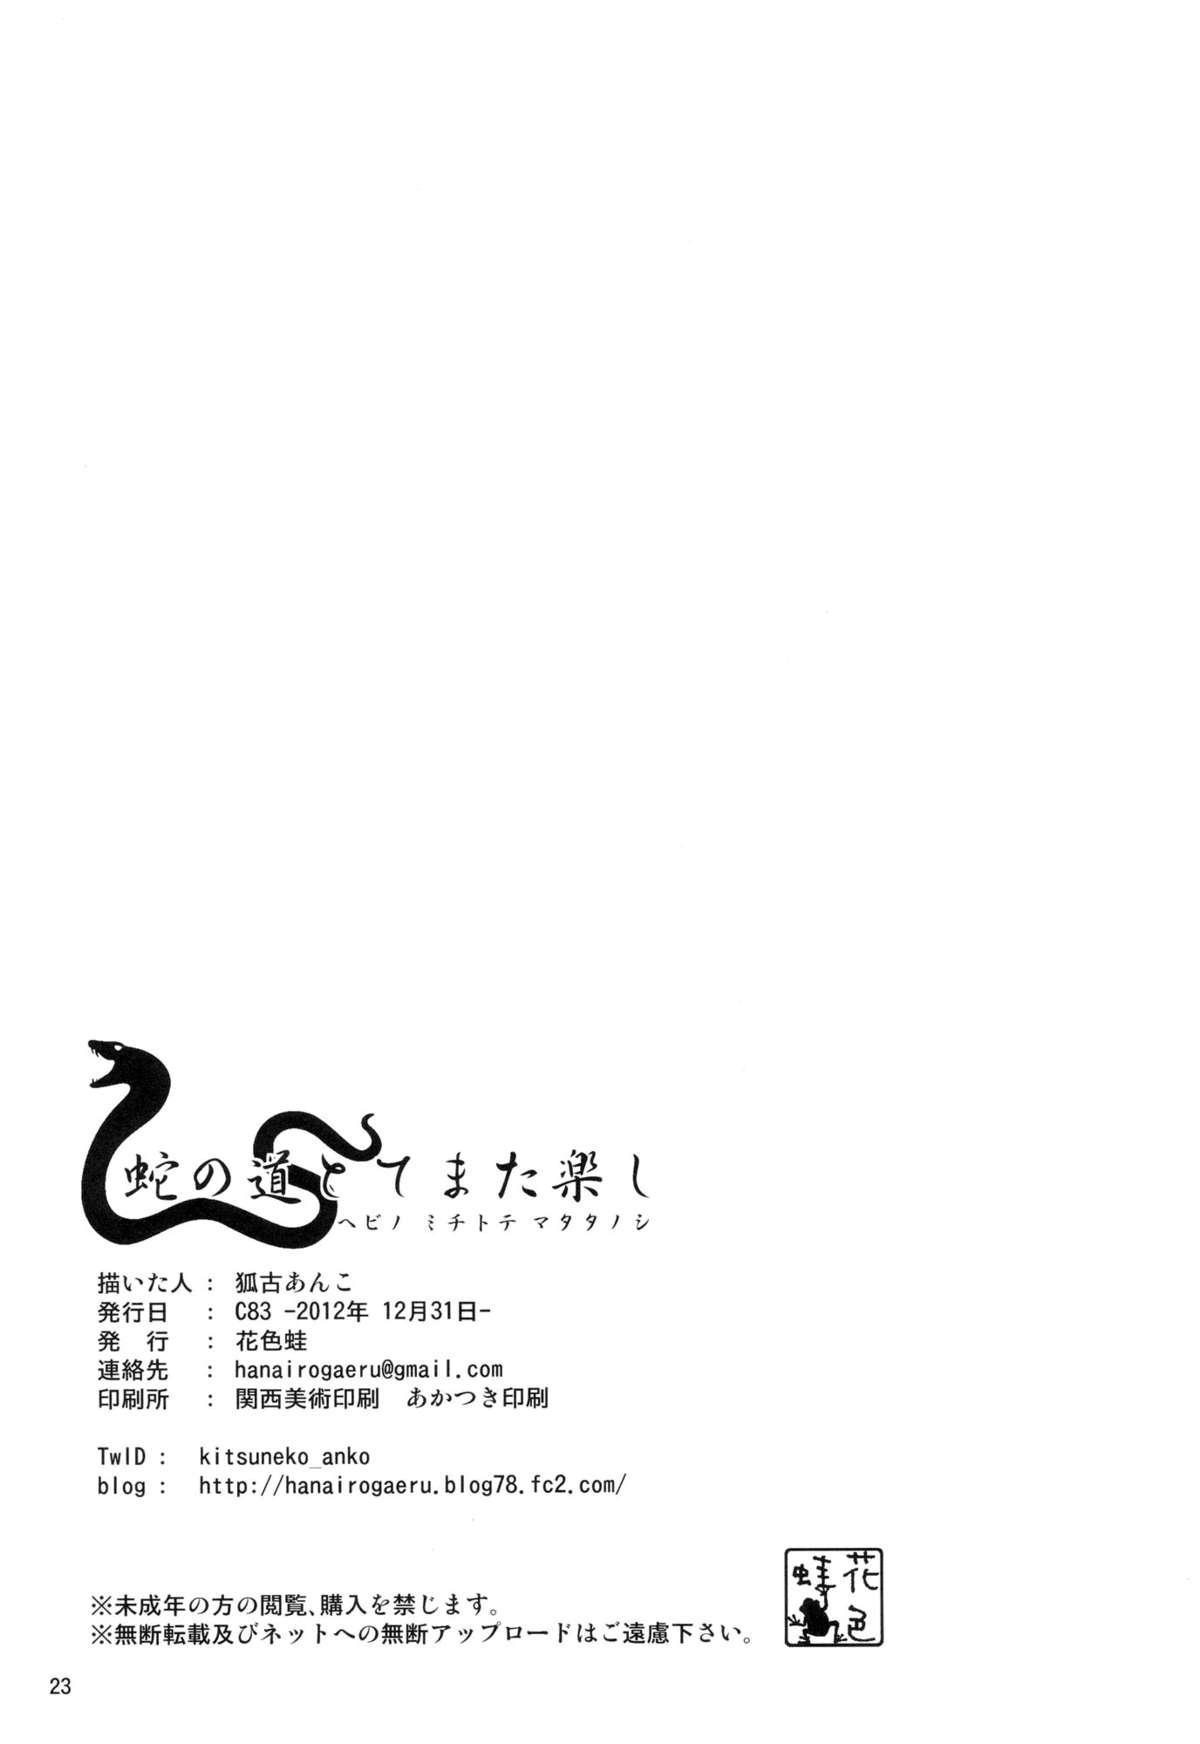 Hebi no Michi Tote Mata Tanoshi | The Trail of The Serpent is Pleasurable 21